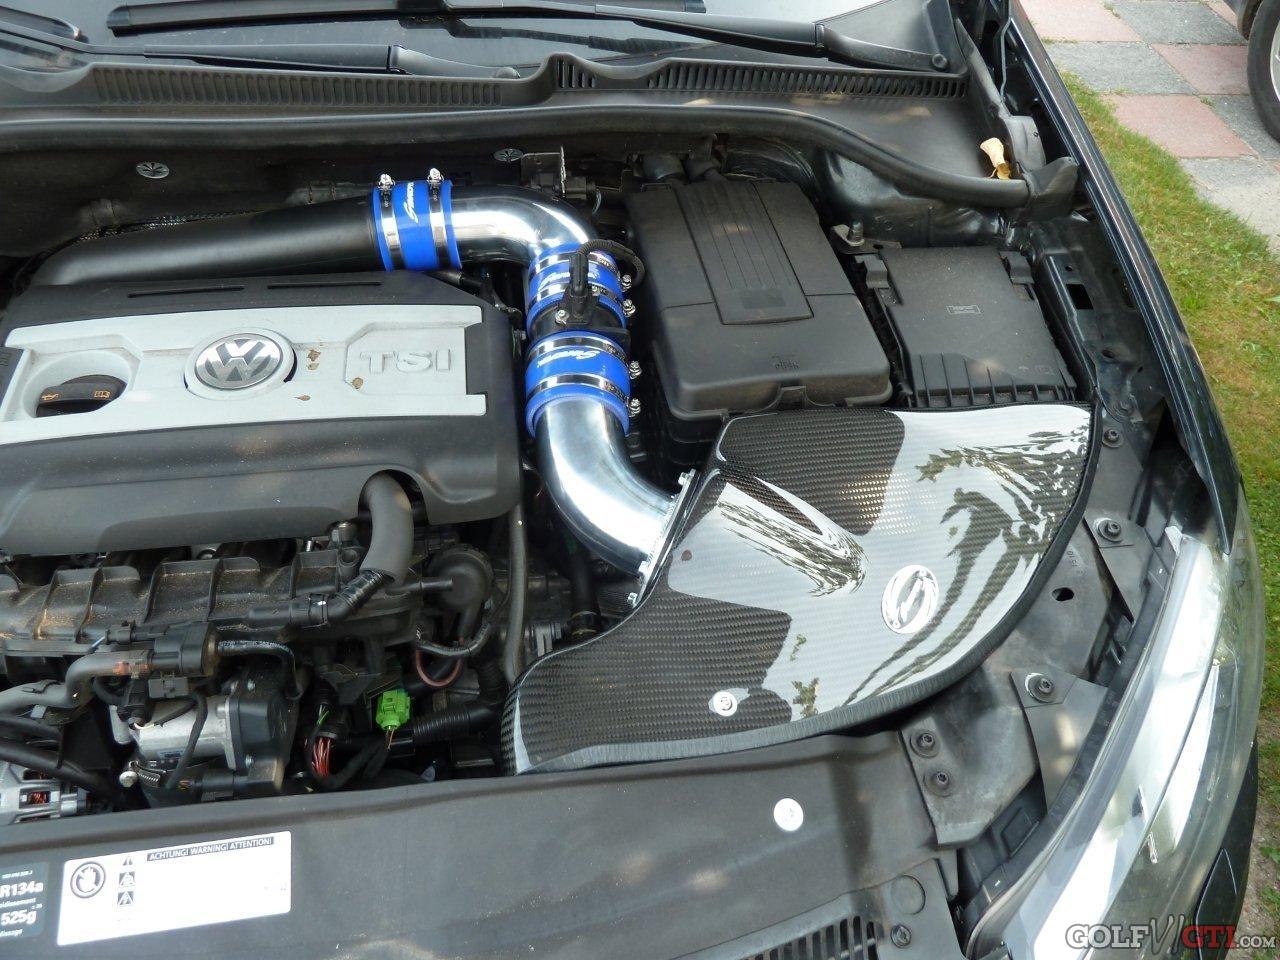 Simota Aero Form Intake System Volkswagen Golf V 2.0 GTI '10-'11